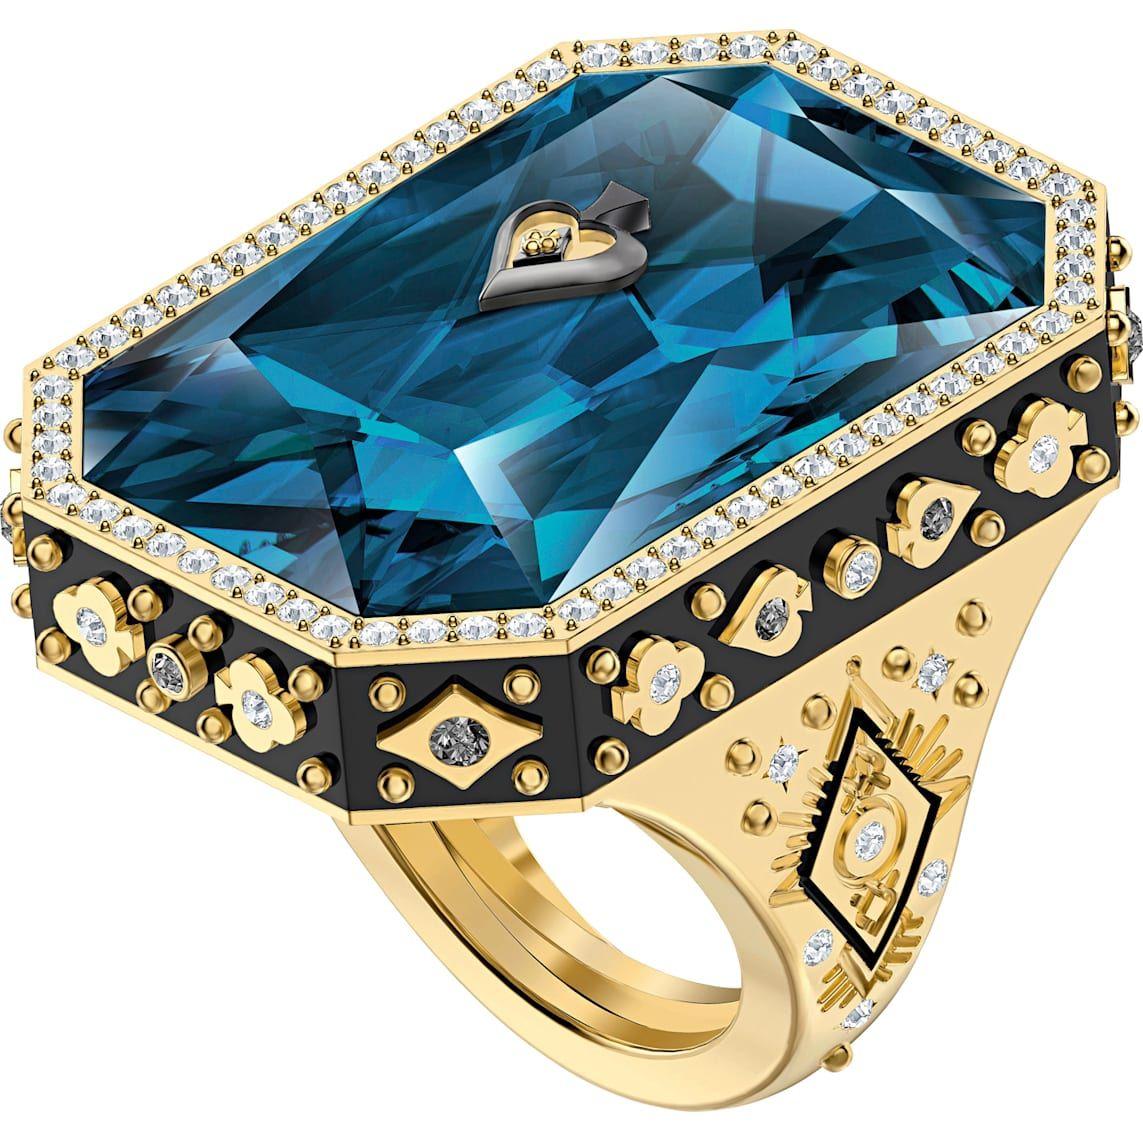 Tarot Magic Cocktail Ring, Blue, Gold-tone plated | Swarovski.com ...